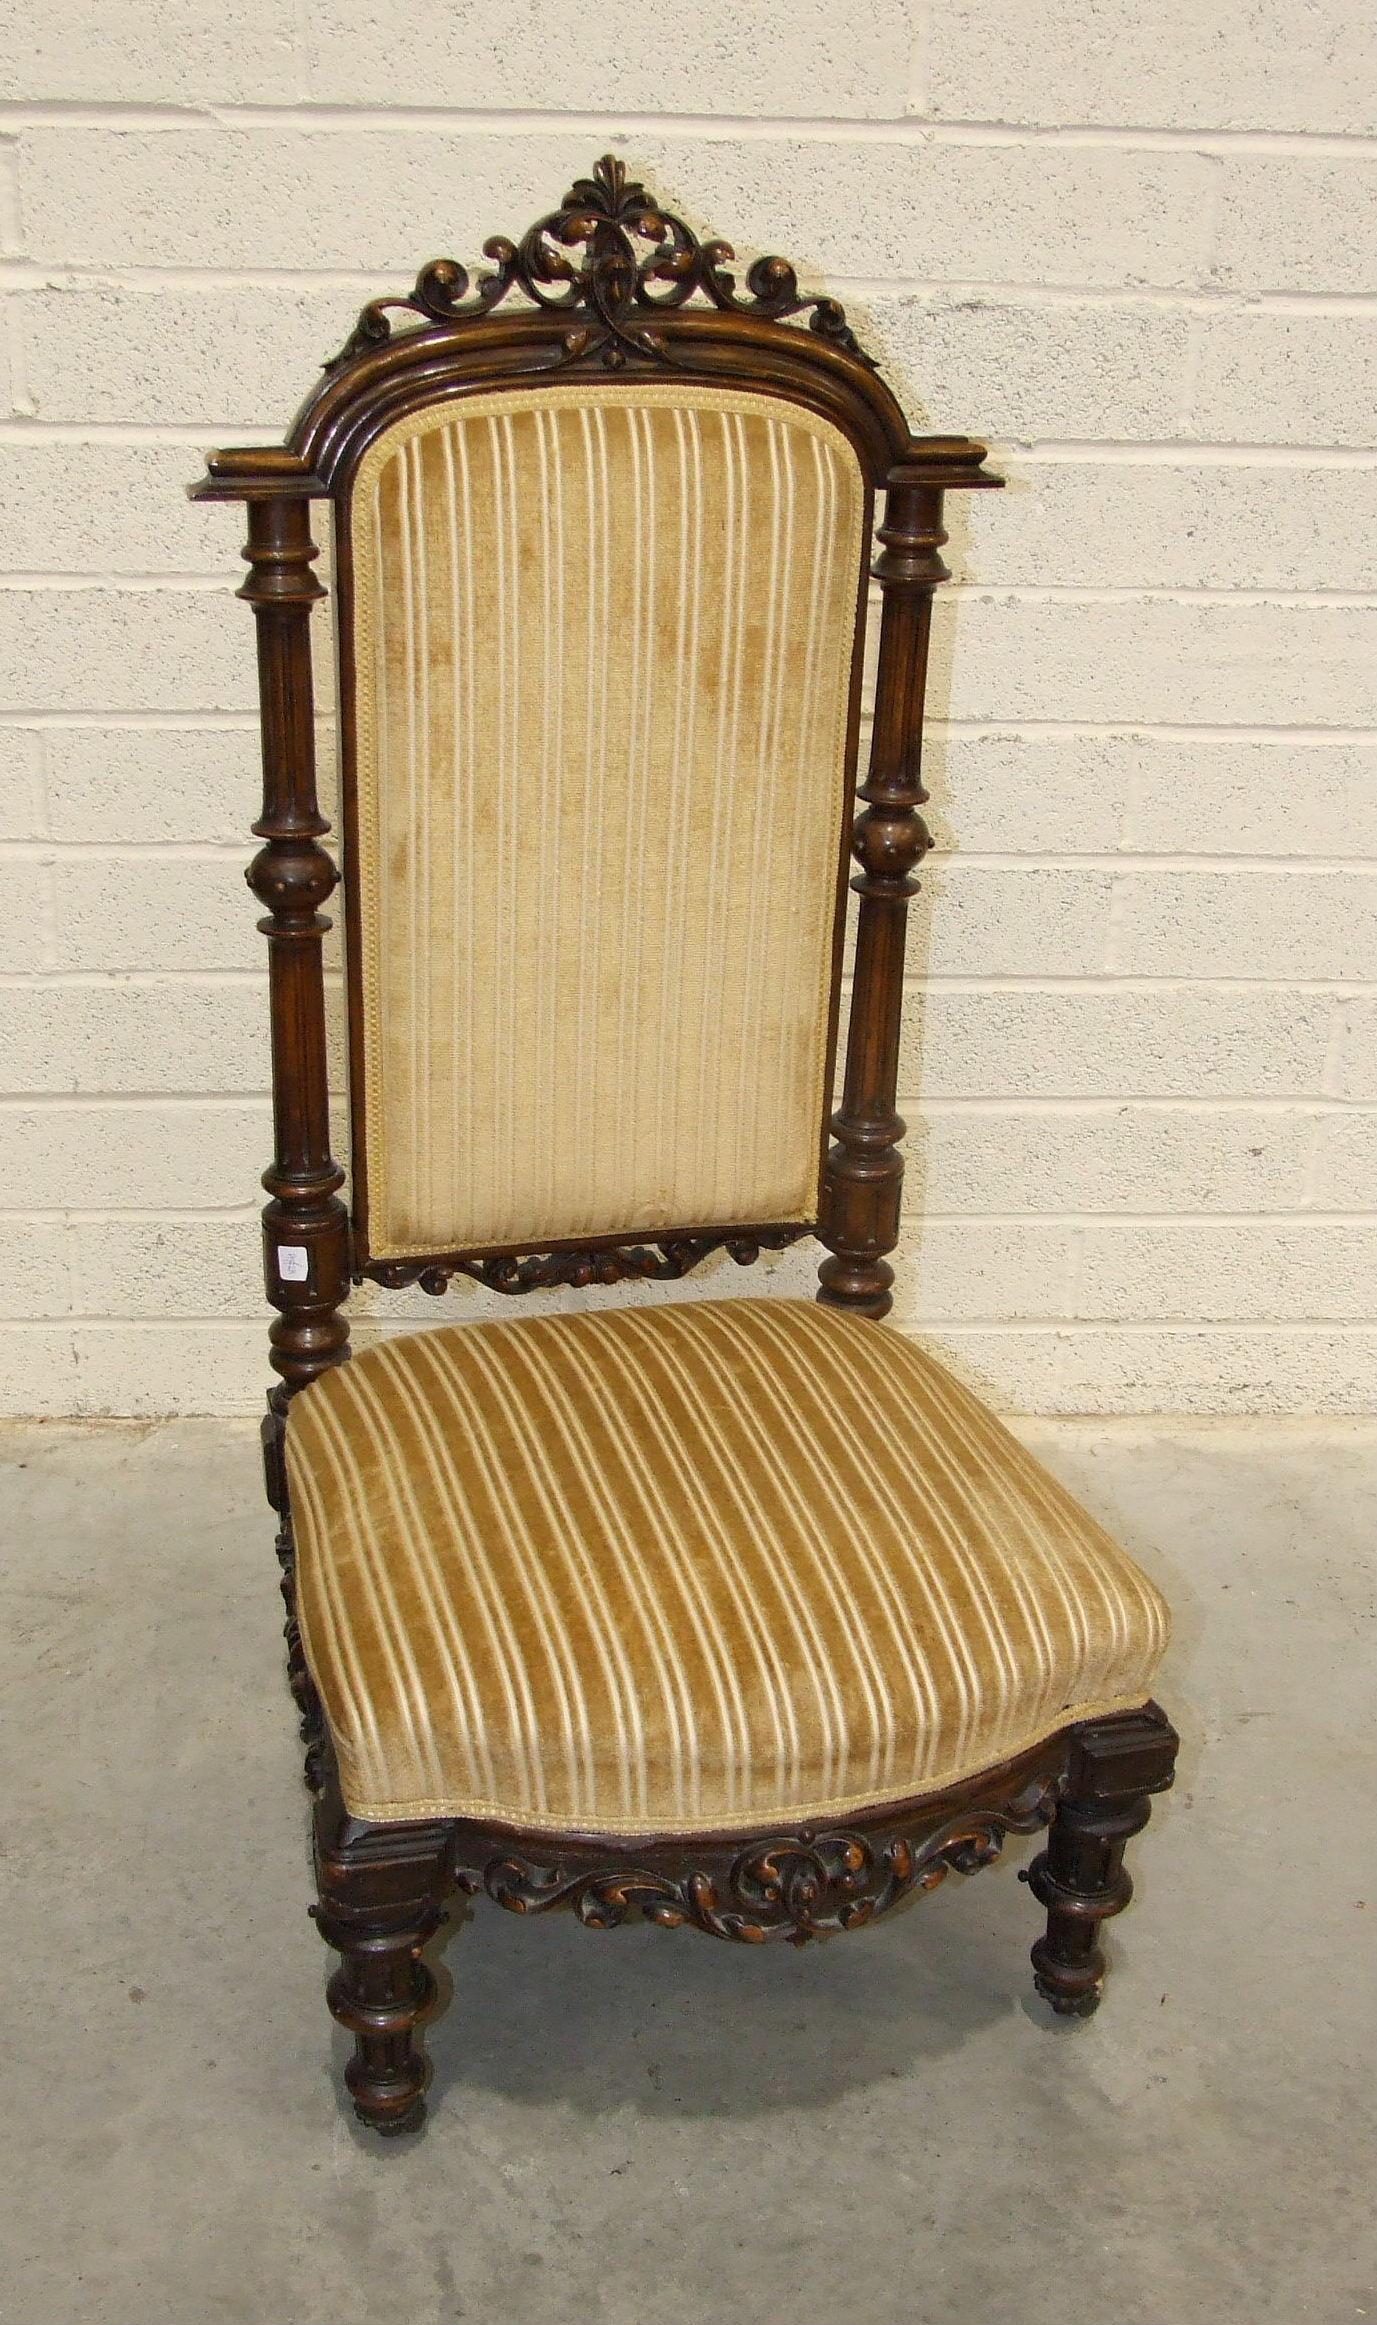 Lot 66 - A Victorian walnut carved high-back nursing chair on turned feet, 112cm high.